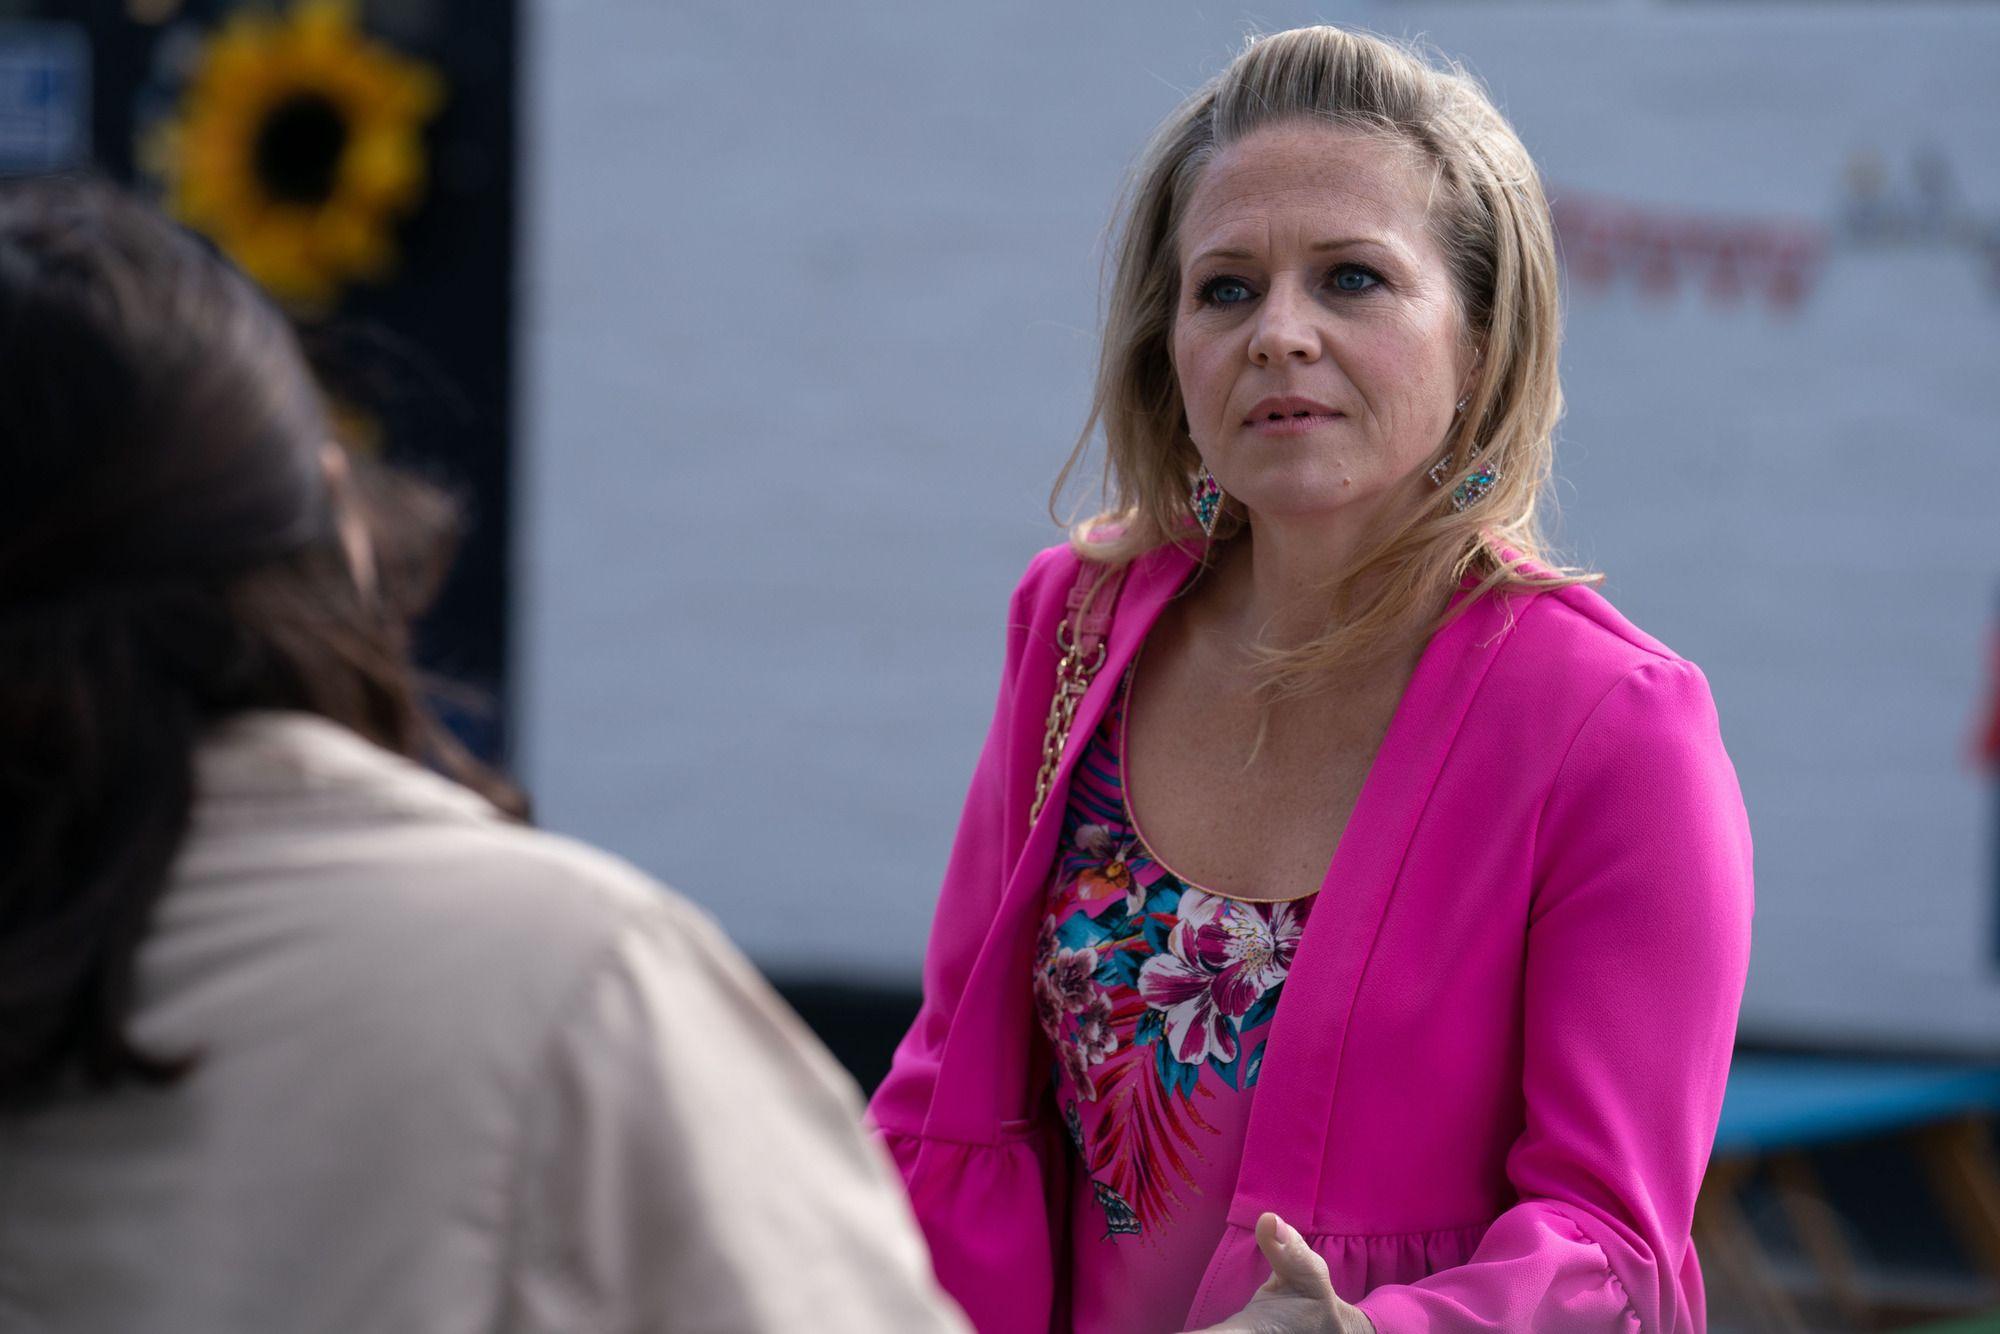 EastEnders is lining up a big new struggle for Linda Carter next week